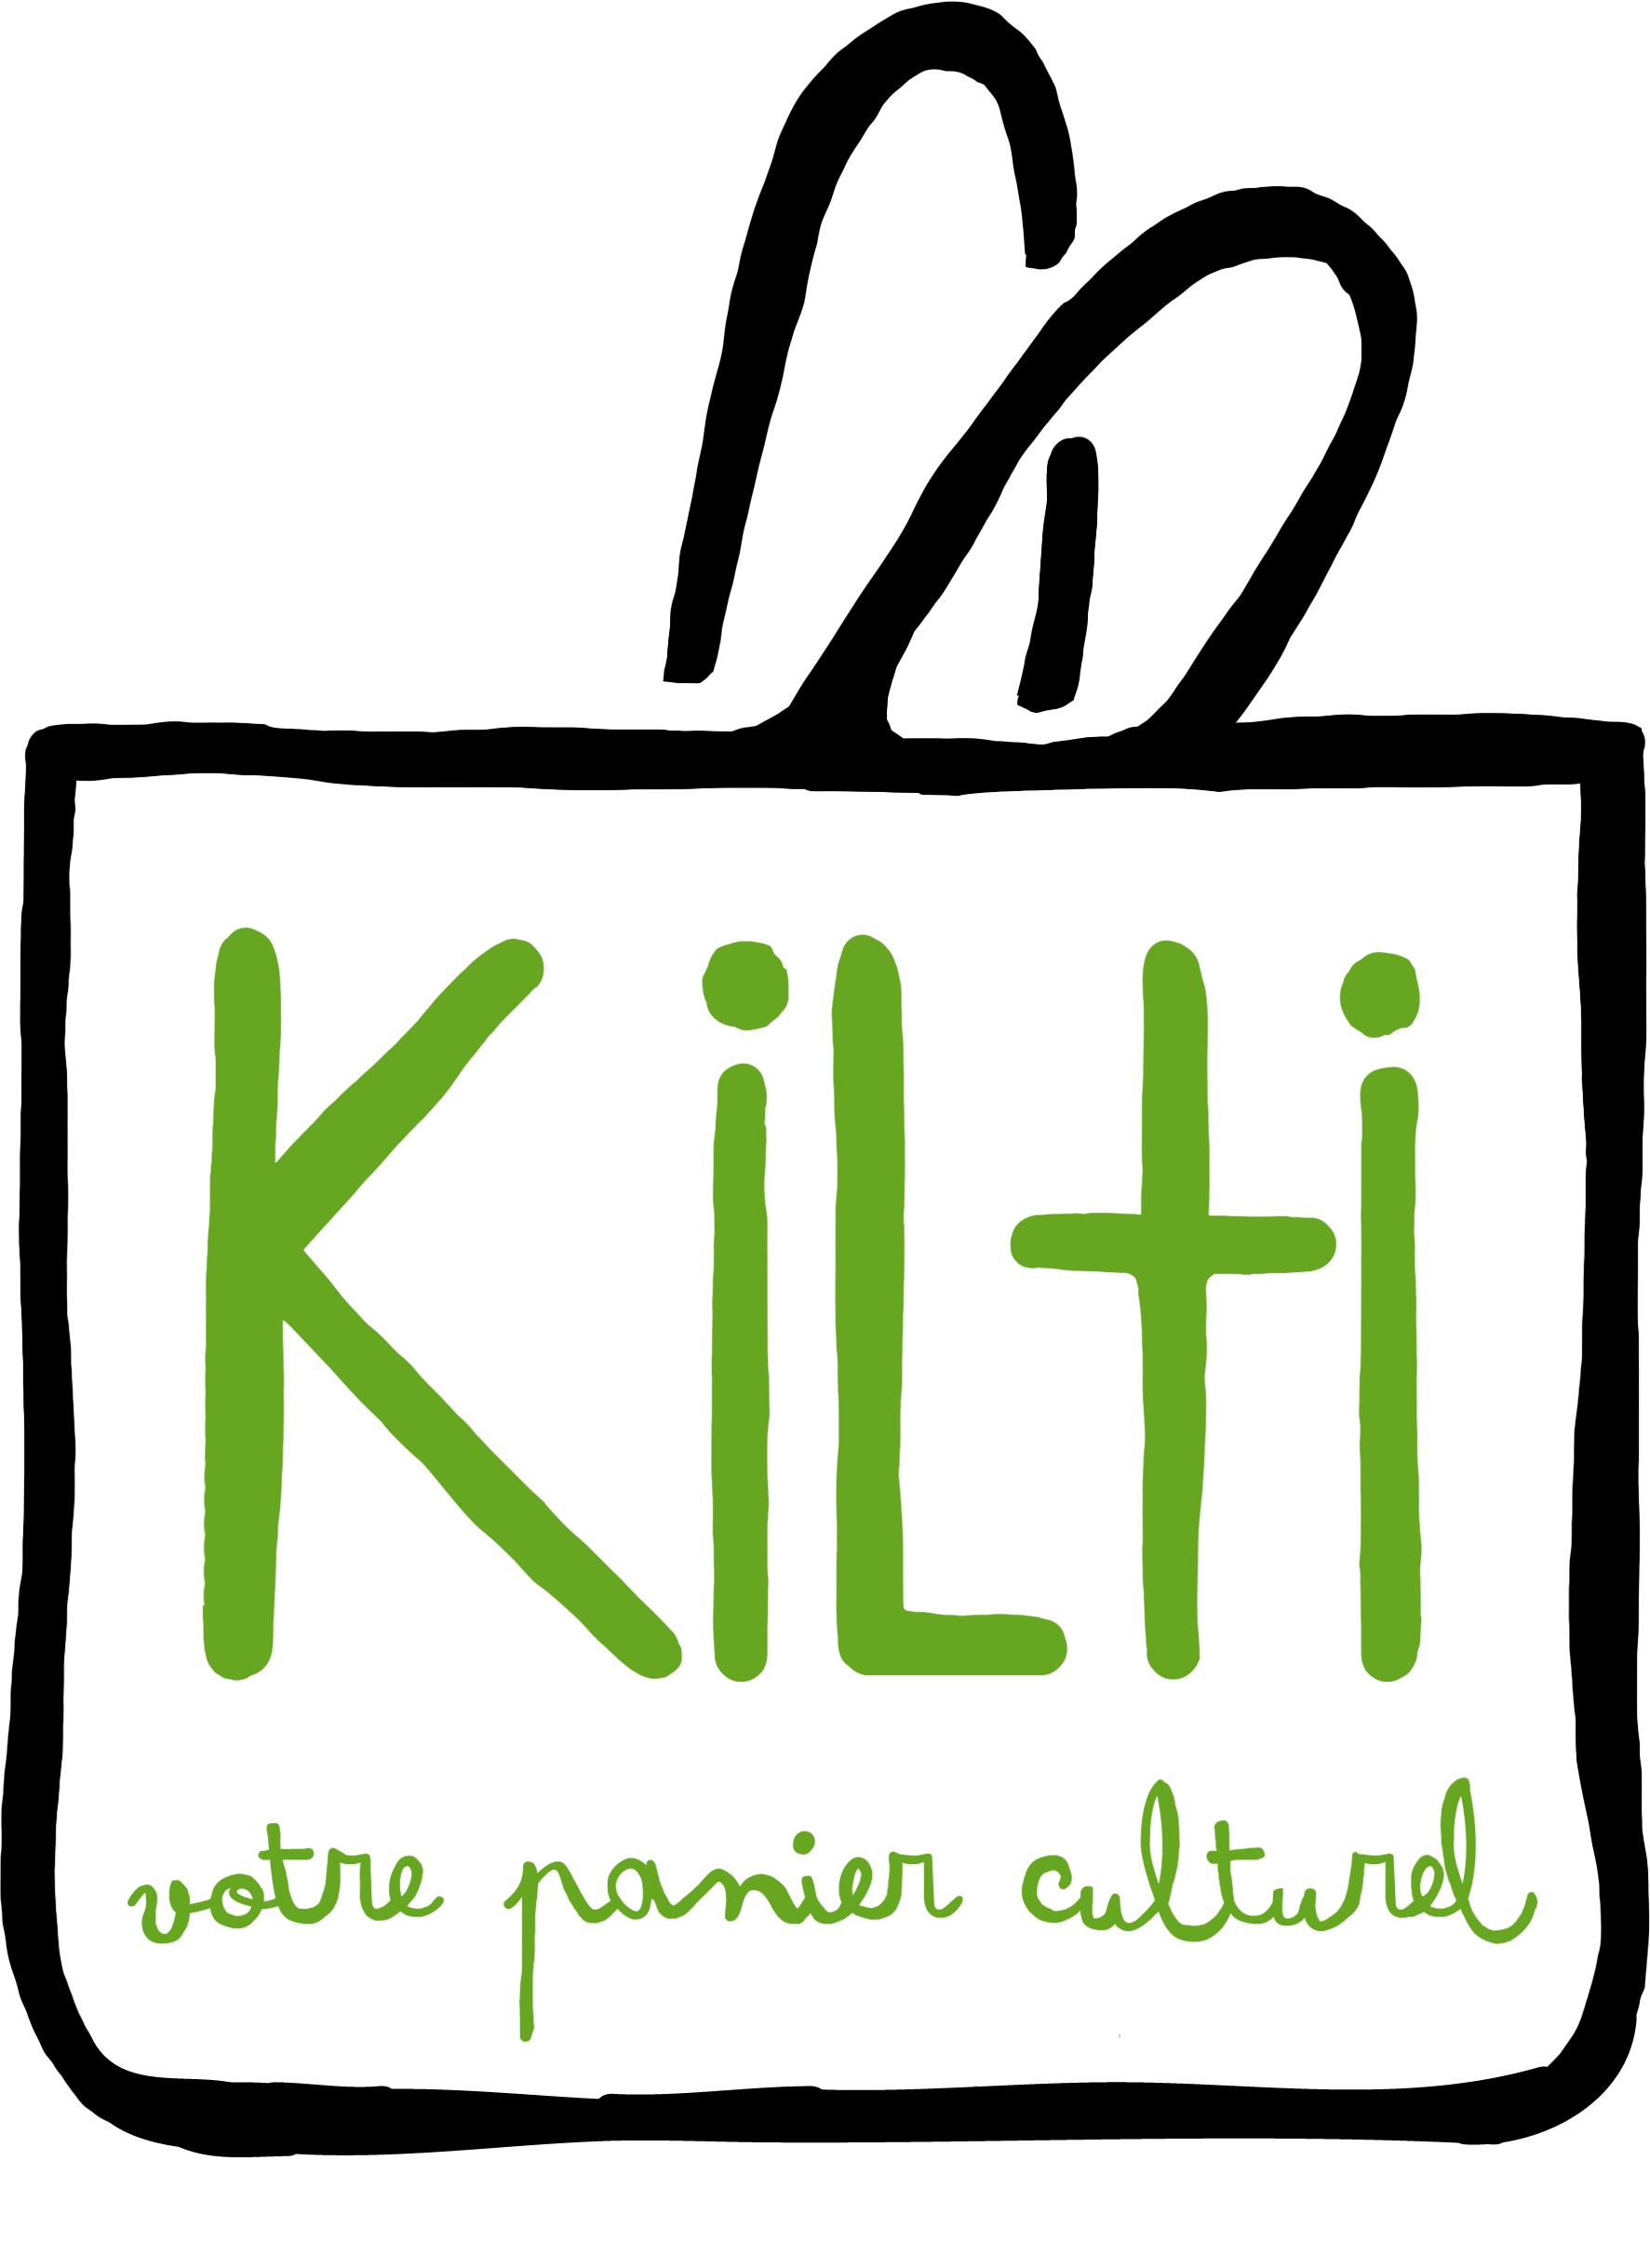 Association - KILTI